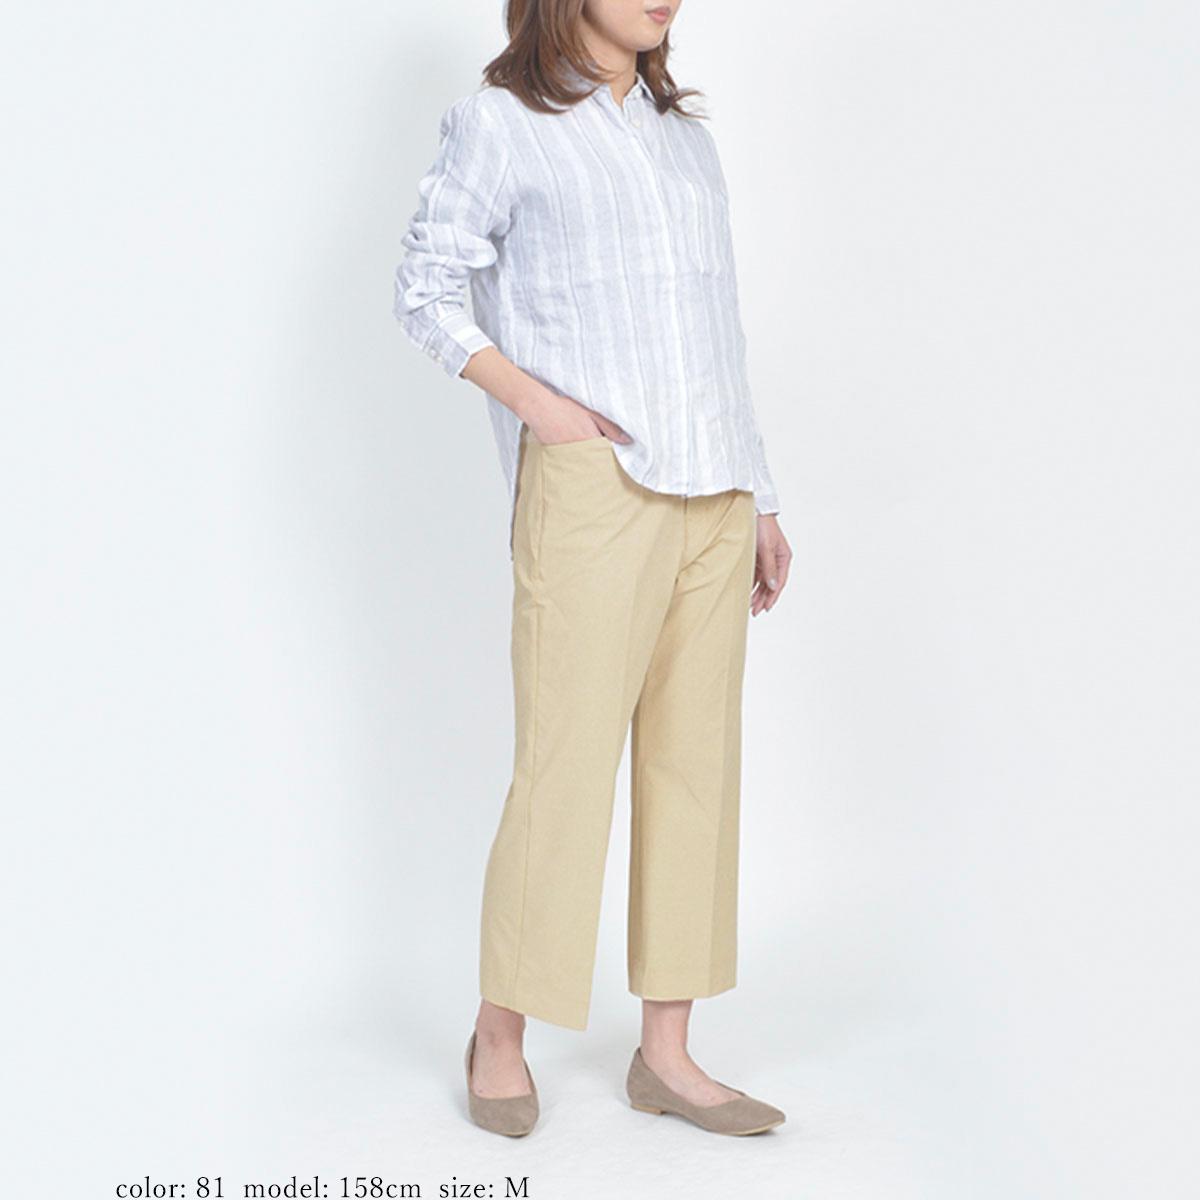 【SALE】Mrs.Jeana GOLD クロップドストレート GM3906